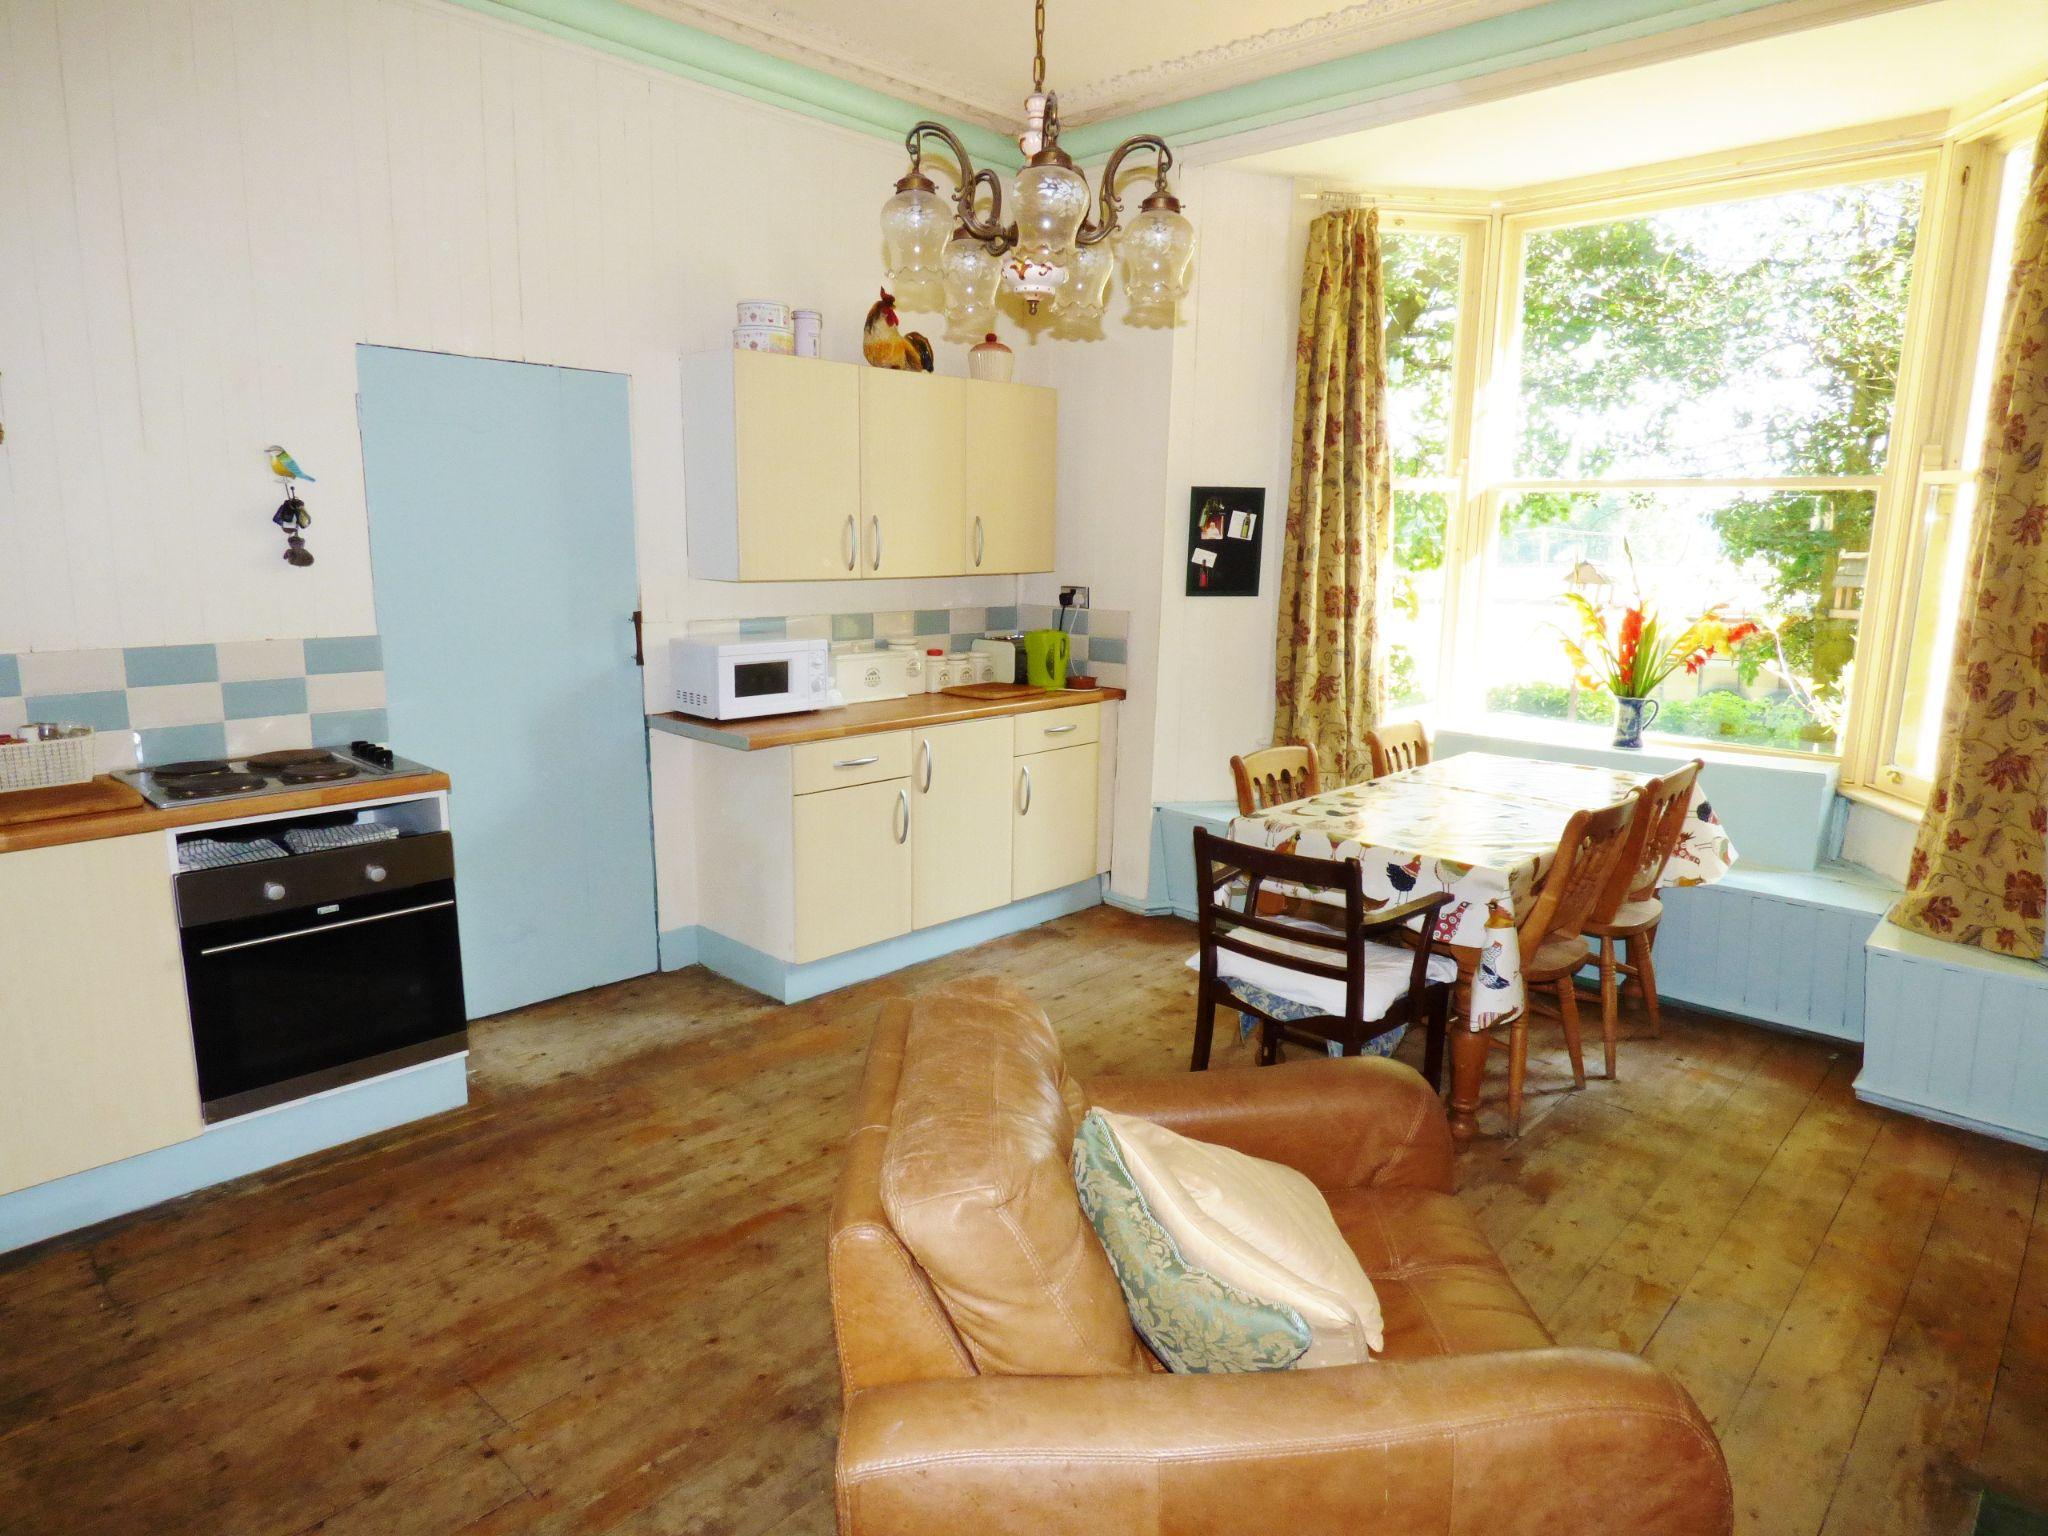 6 Bedroom Detached House For Sale - Dining Kitchen